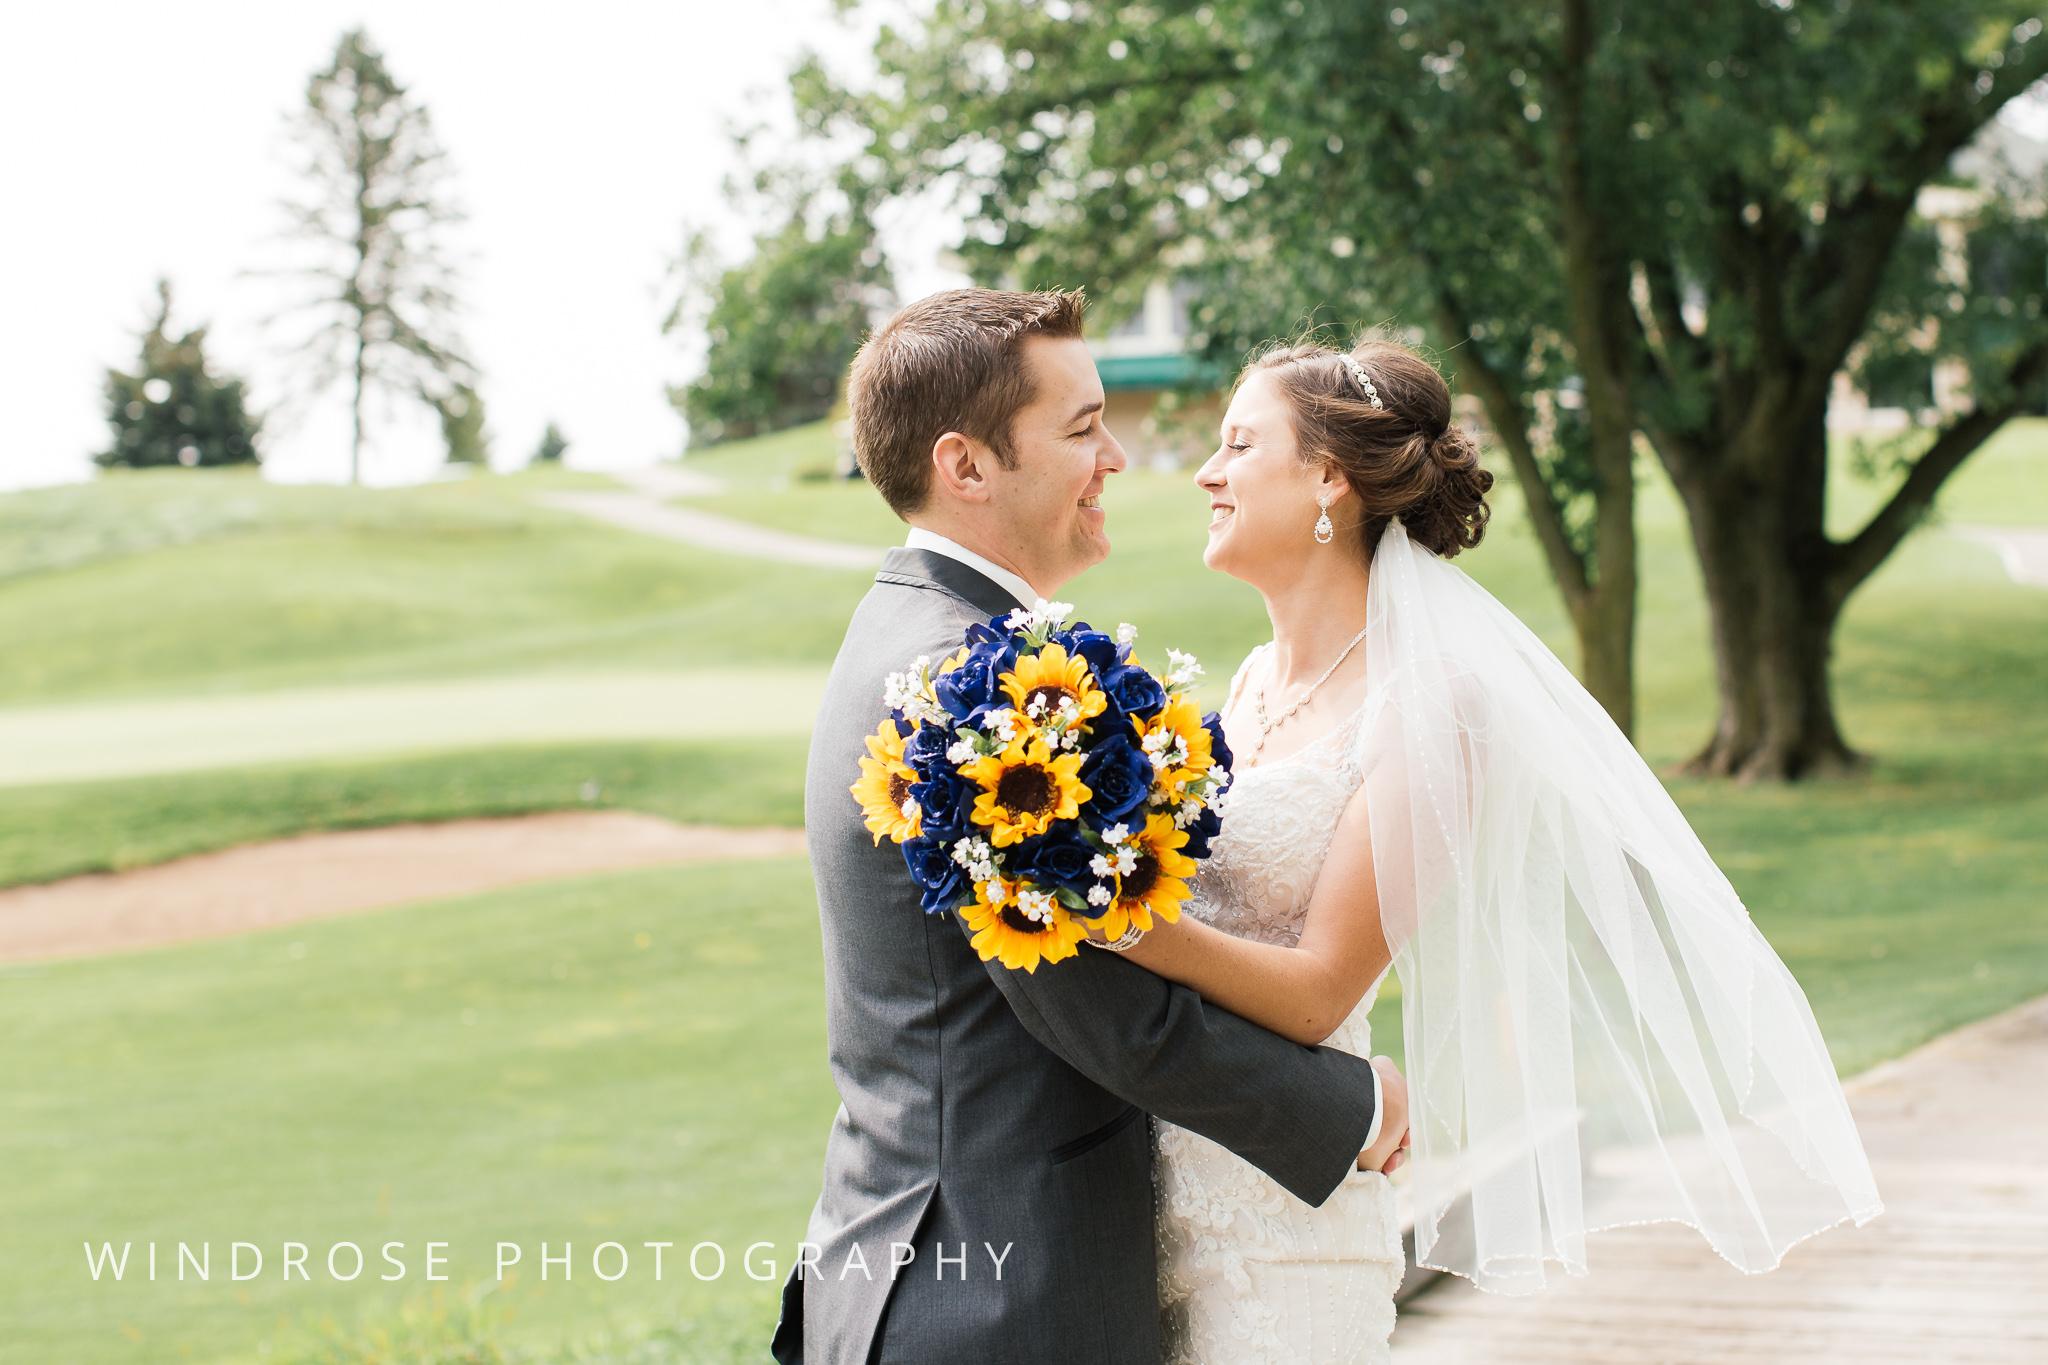 La-Crosse-Country-Club-Wedding-Minnesota-Wedding-Photographer-5.jpg